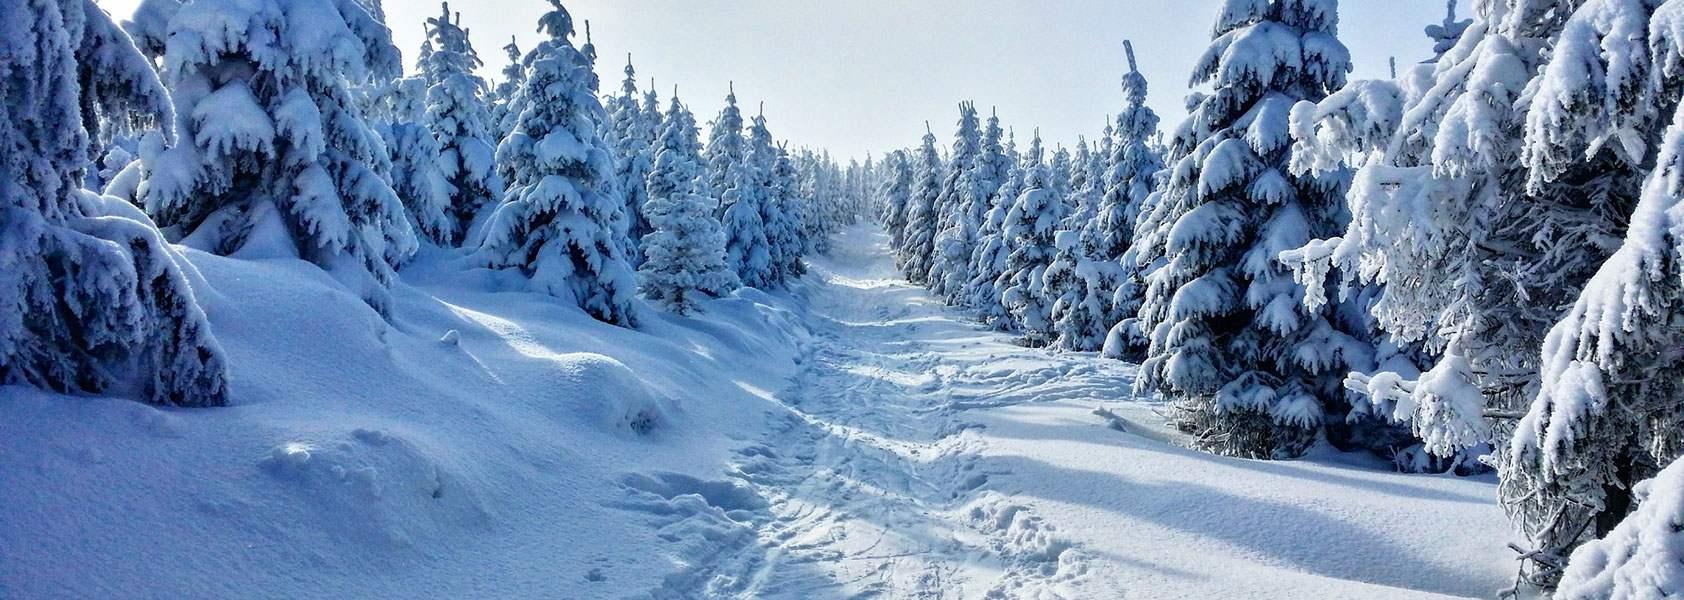 Tsjechië | Actieve langlauf- en sneeuwschoen wandelwinterreis